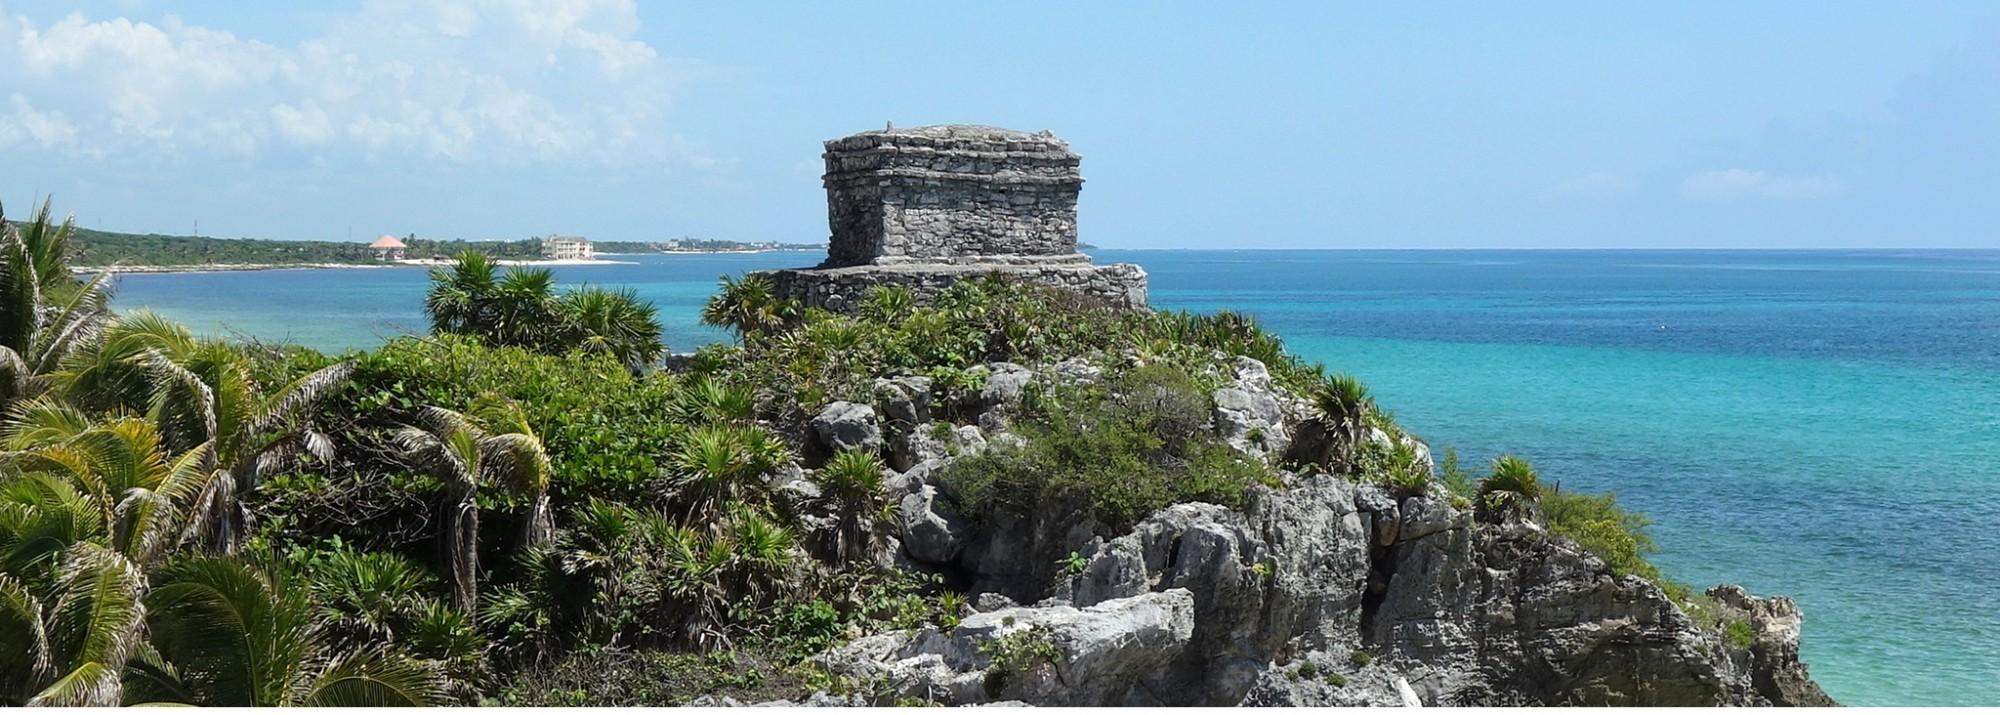 Mexiko, Tulum: Das berühmte Postkartenbild der Maya Ruinen von Tulum